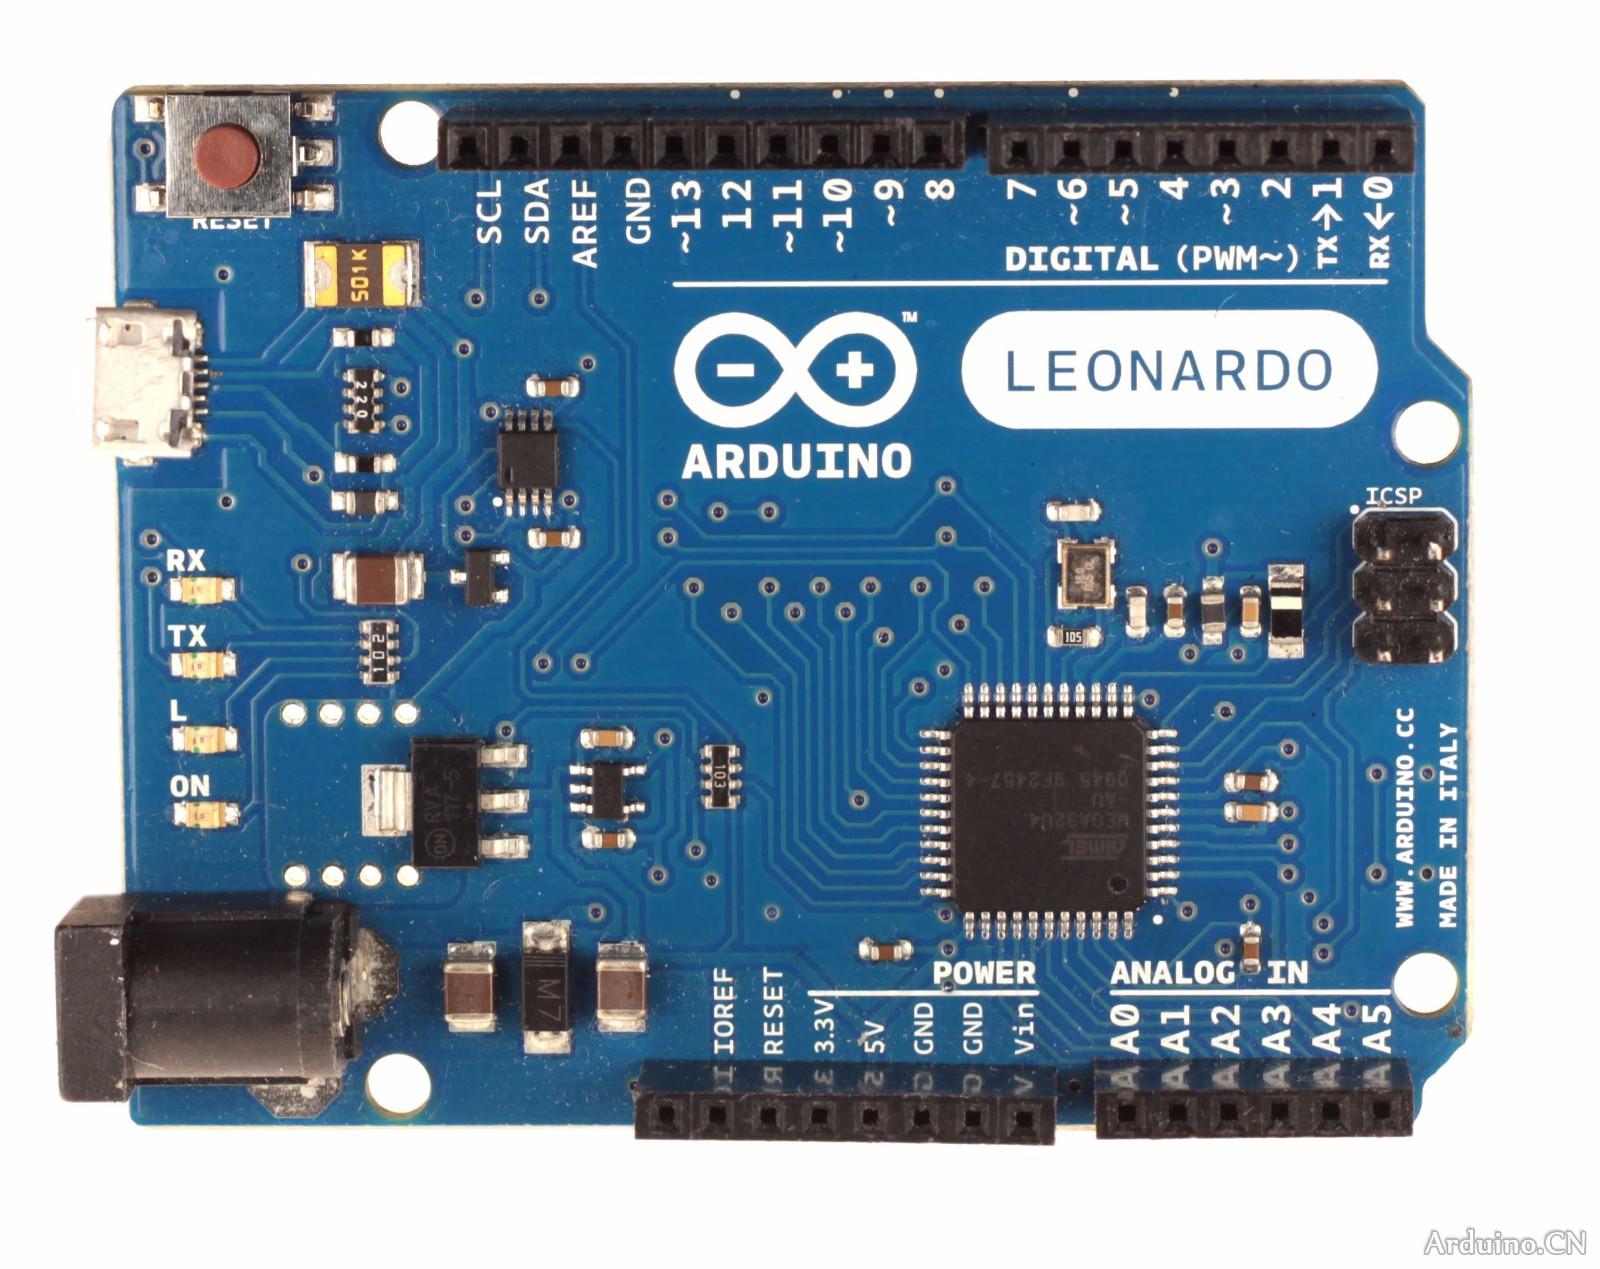 arduino leonardox1,led灯x4(红,绿,黄,白),hlk-rm04 wifi模块x1,人体